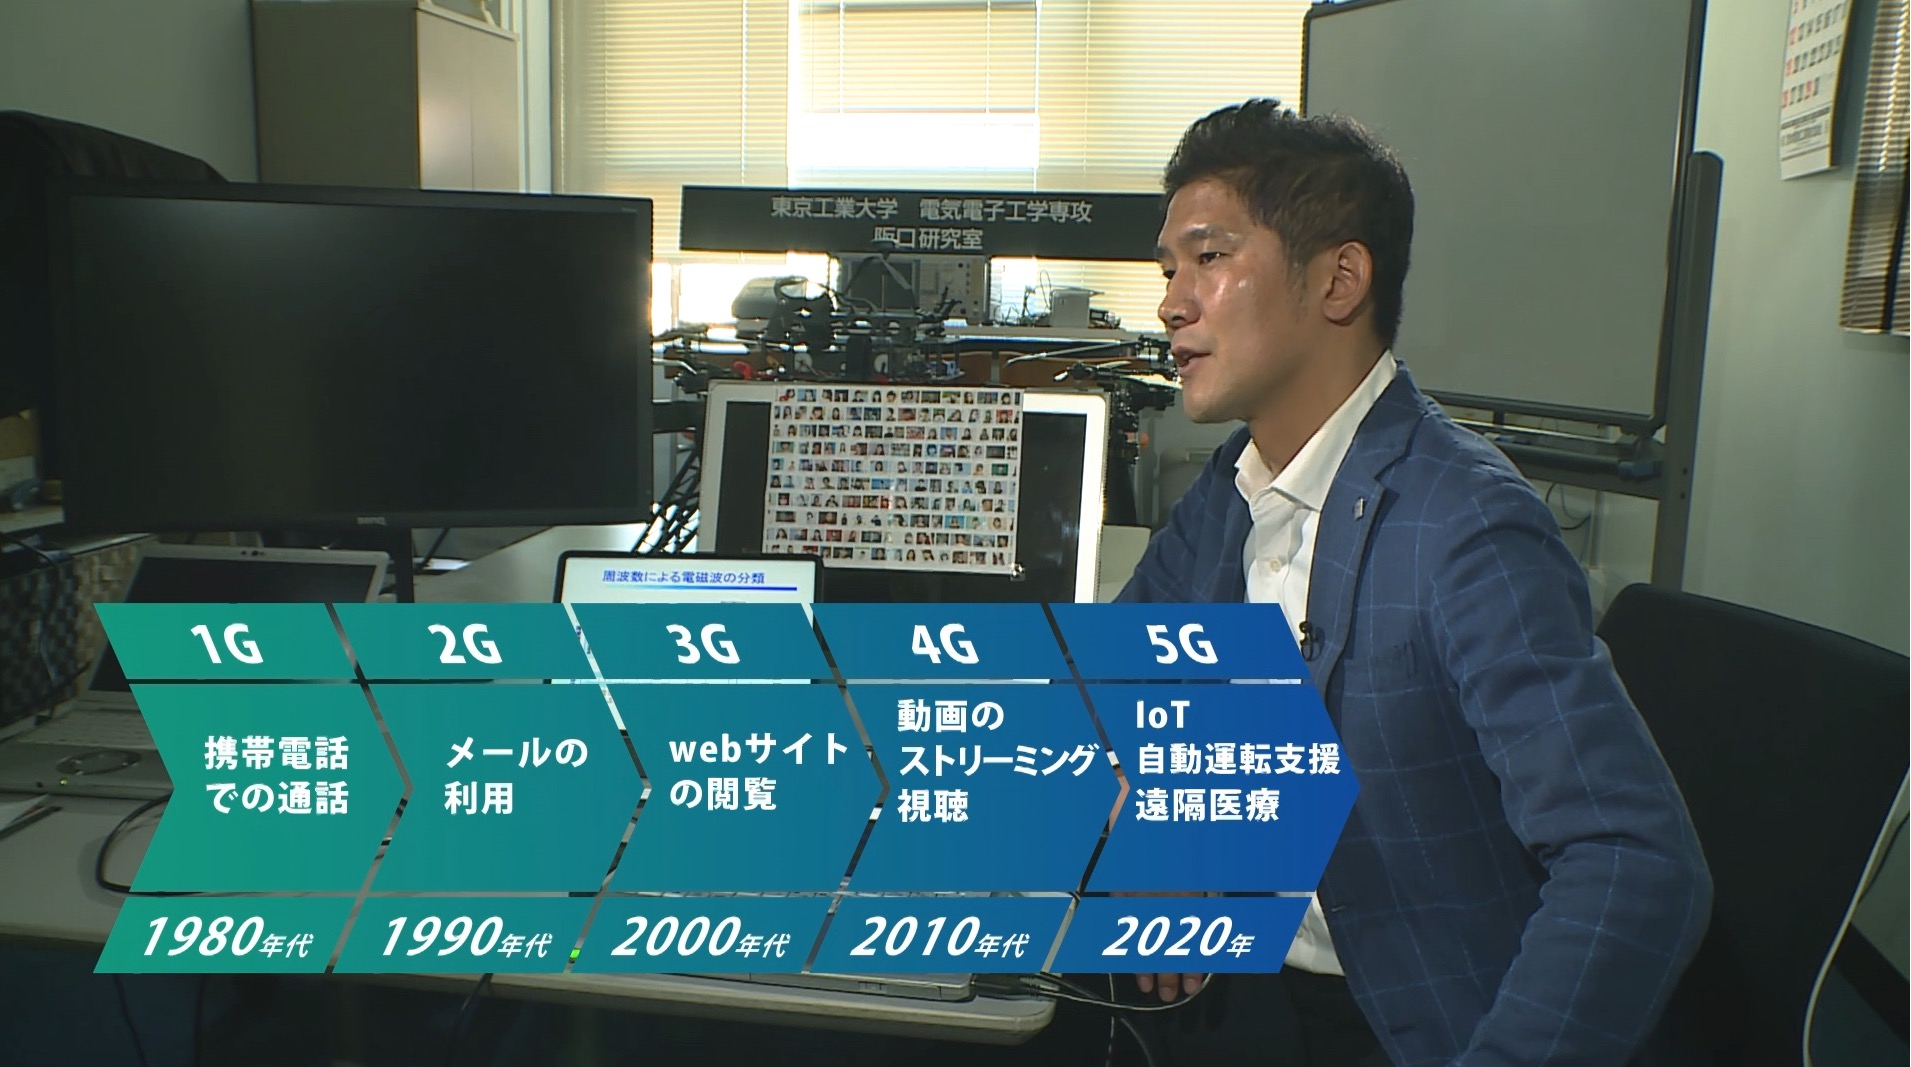 Prof. Sakaguchi explained 5G in BS Fuji 「GALILEO X」